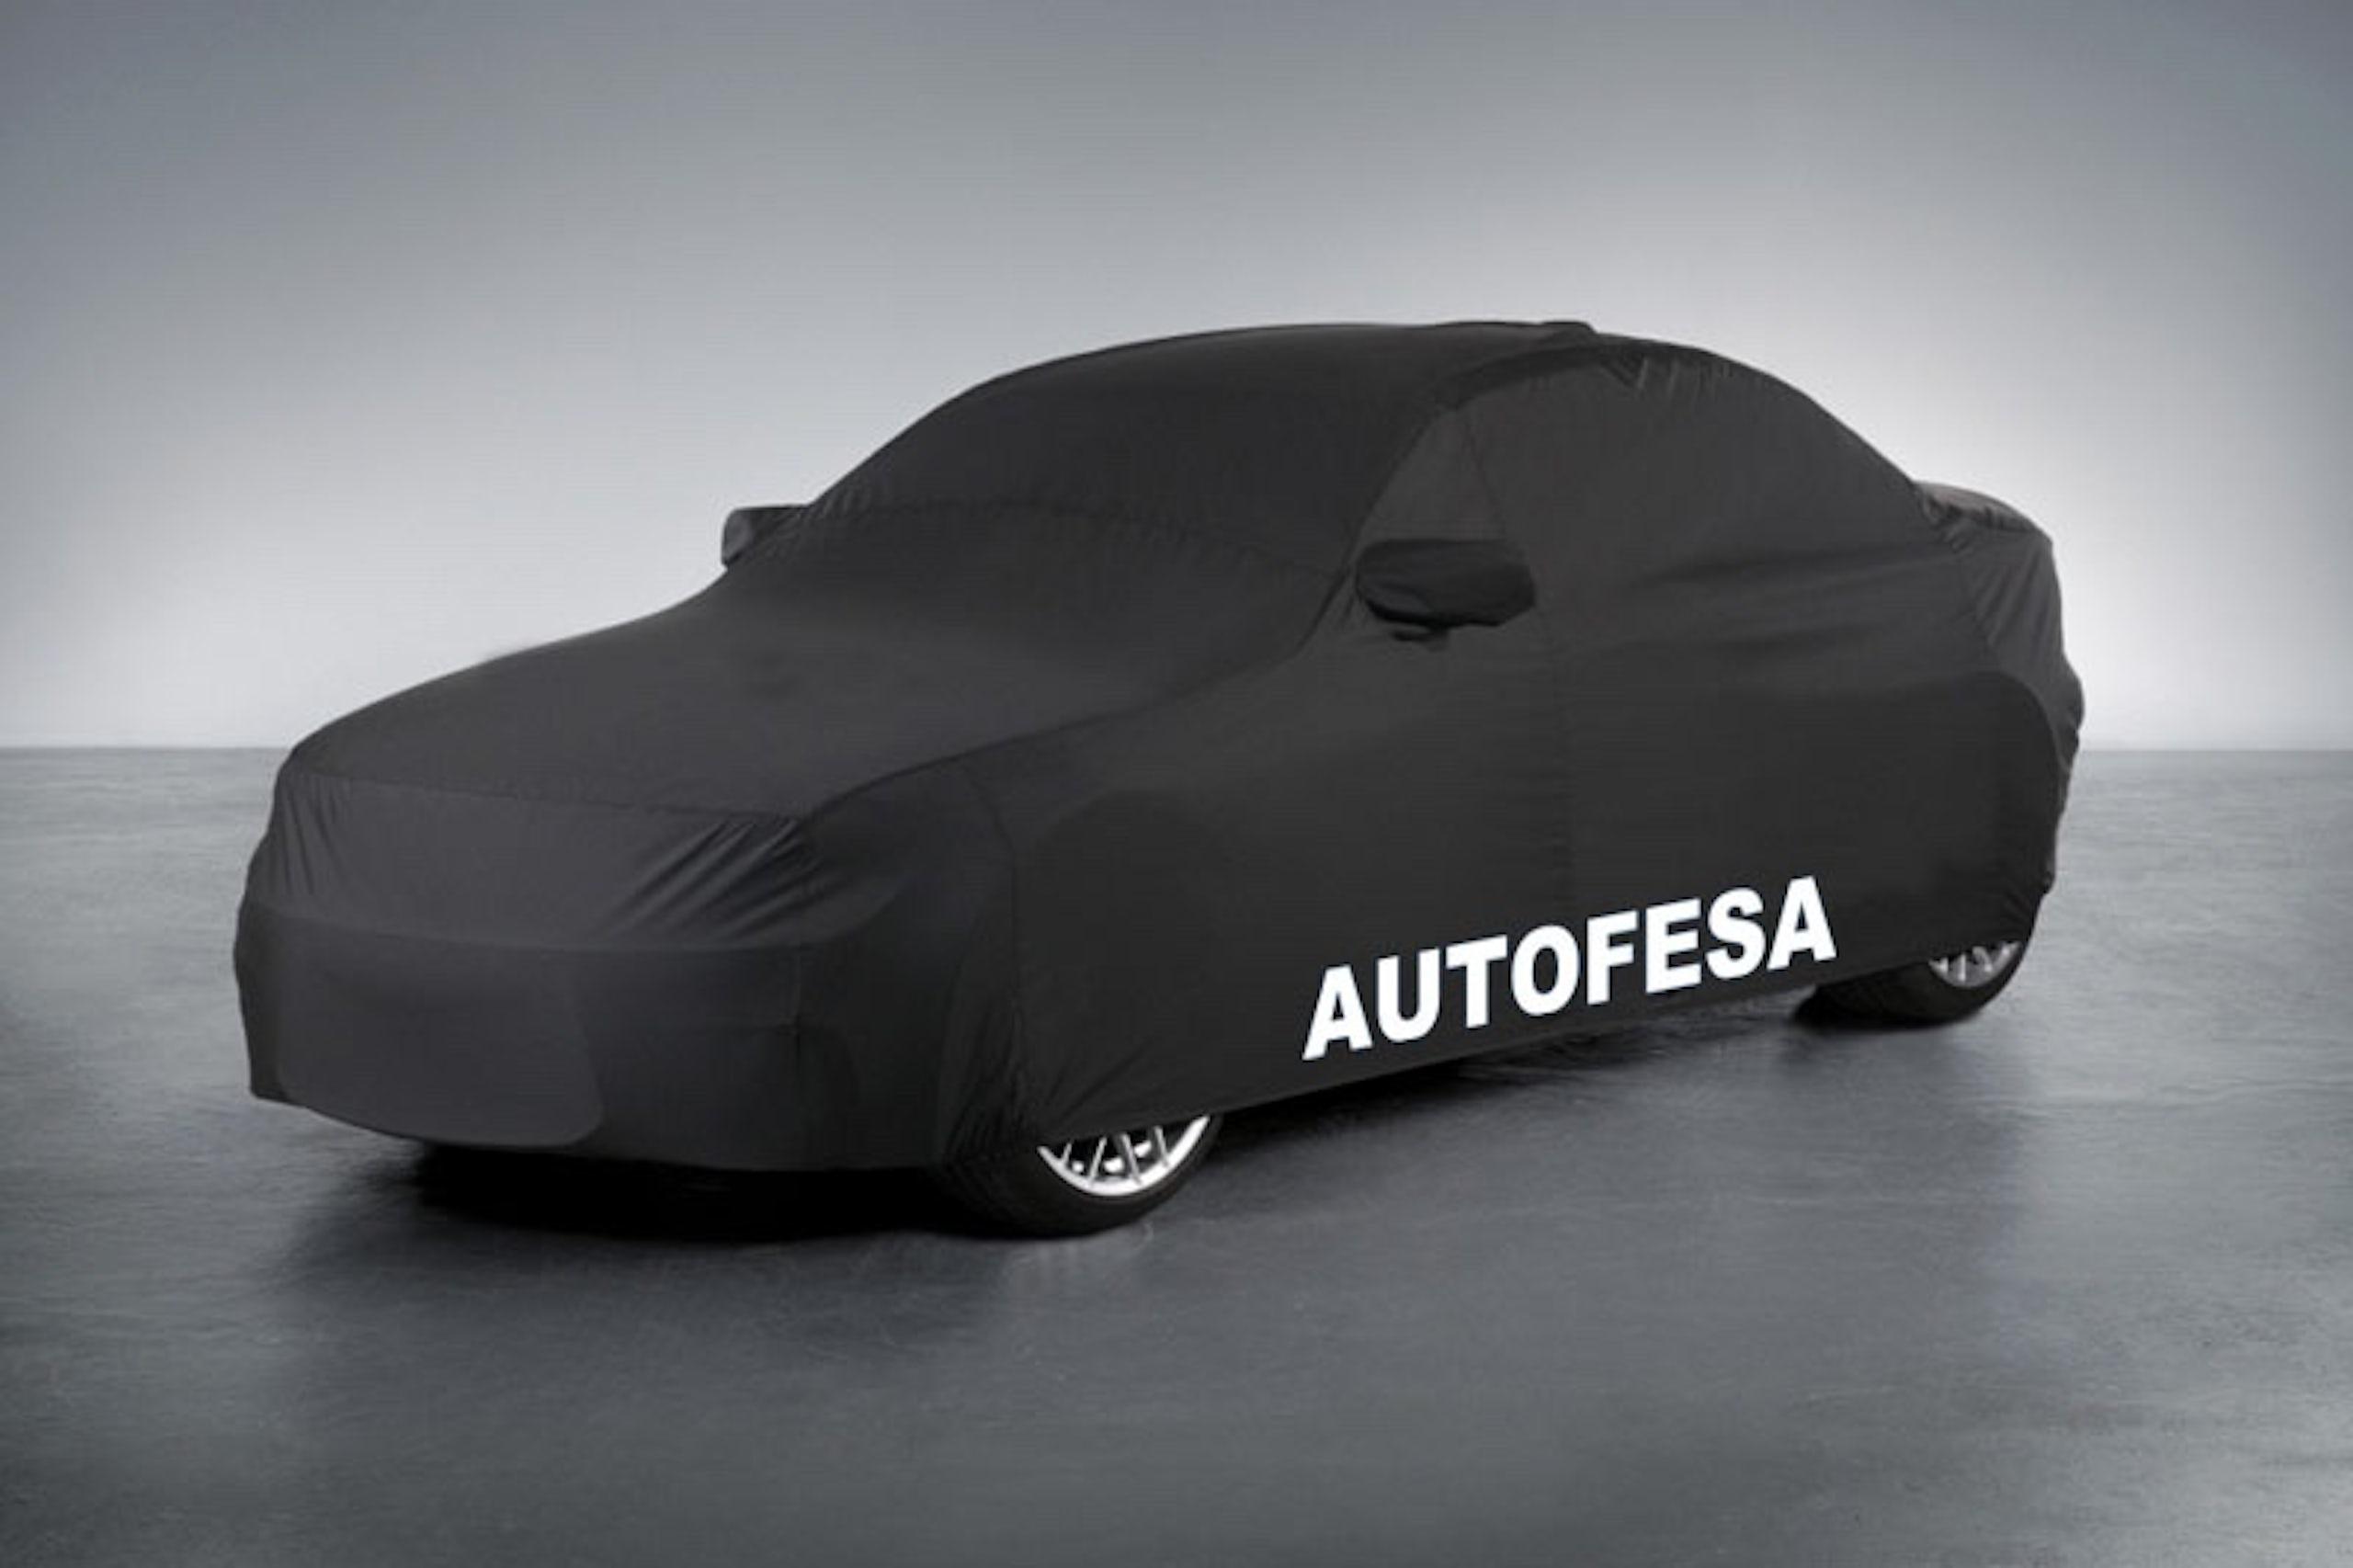 Lexus Nx 300h 300h 2.5 197cv Luxury 4WD 5p CVT Auto - Foto 30